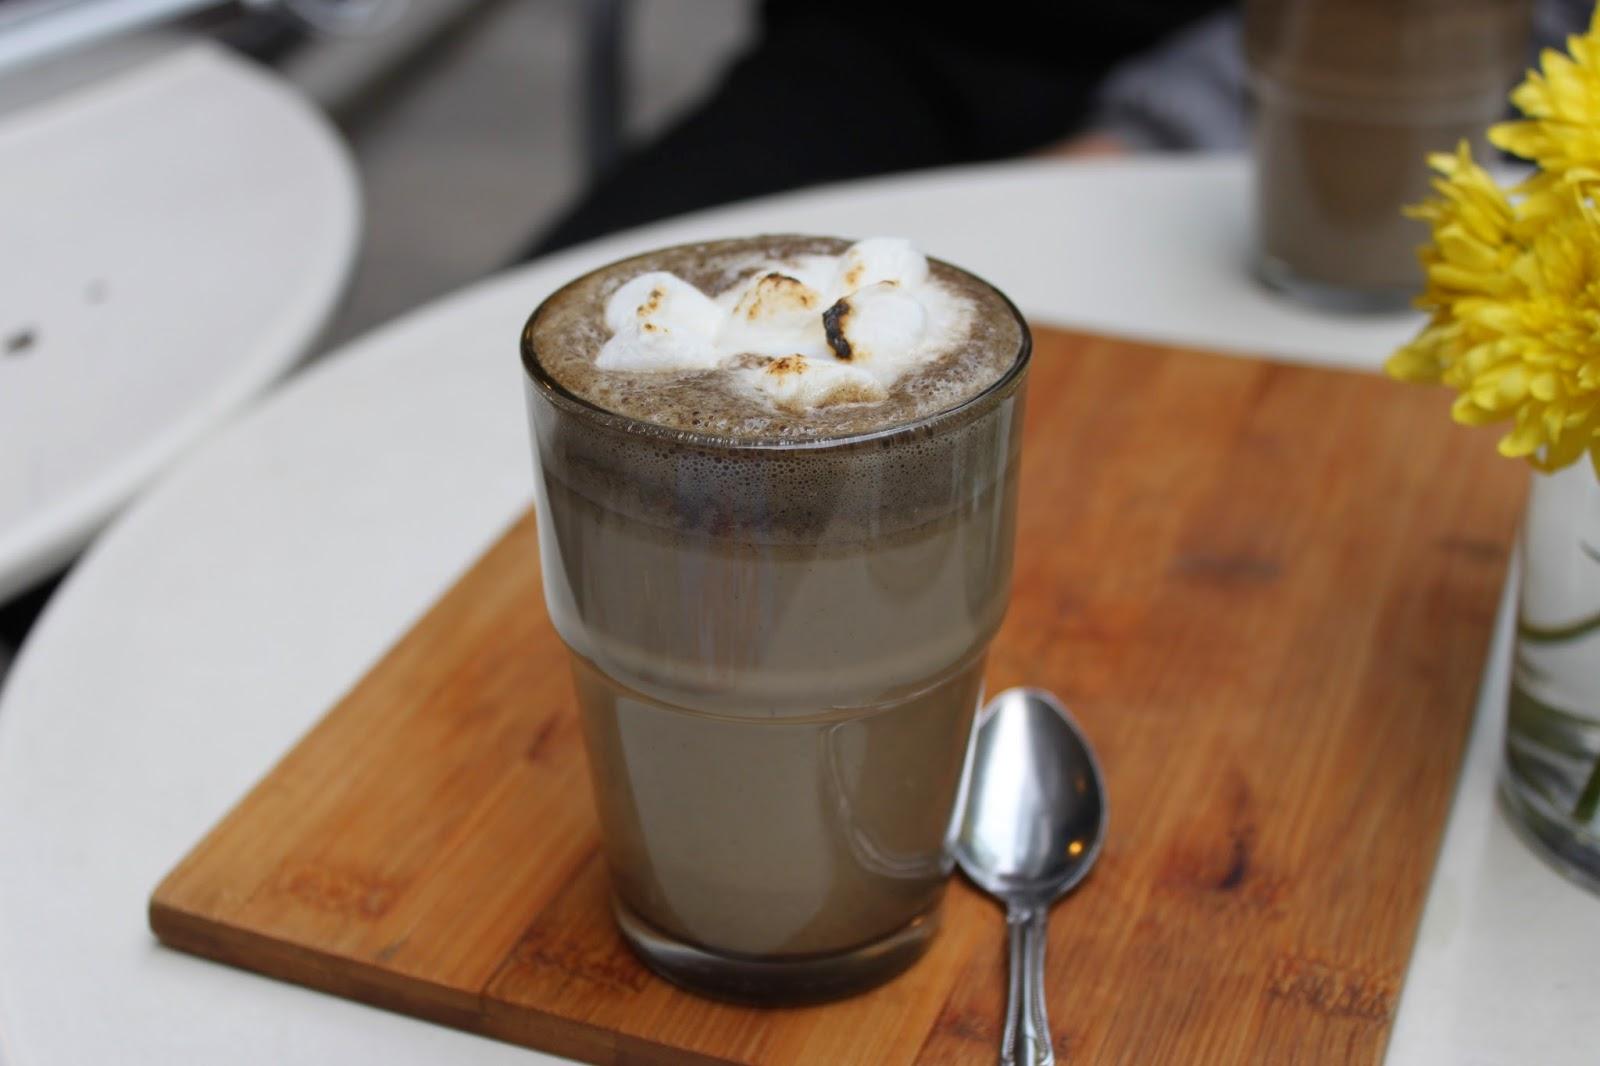 Sinmei Tea Hojicha hot chocolate, Spot The Food